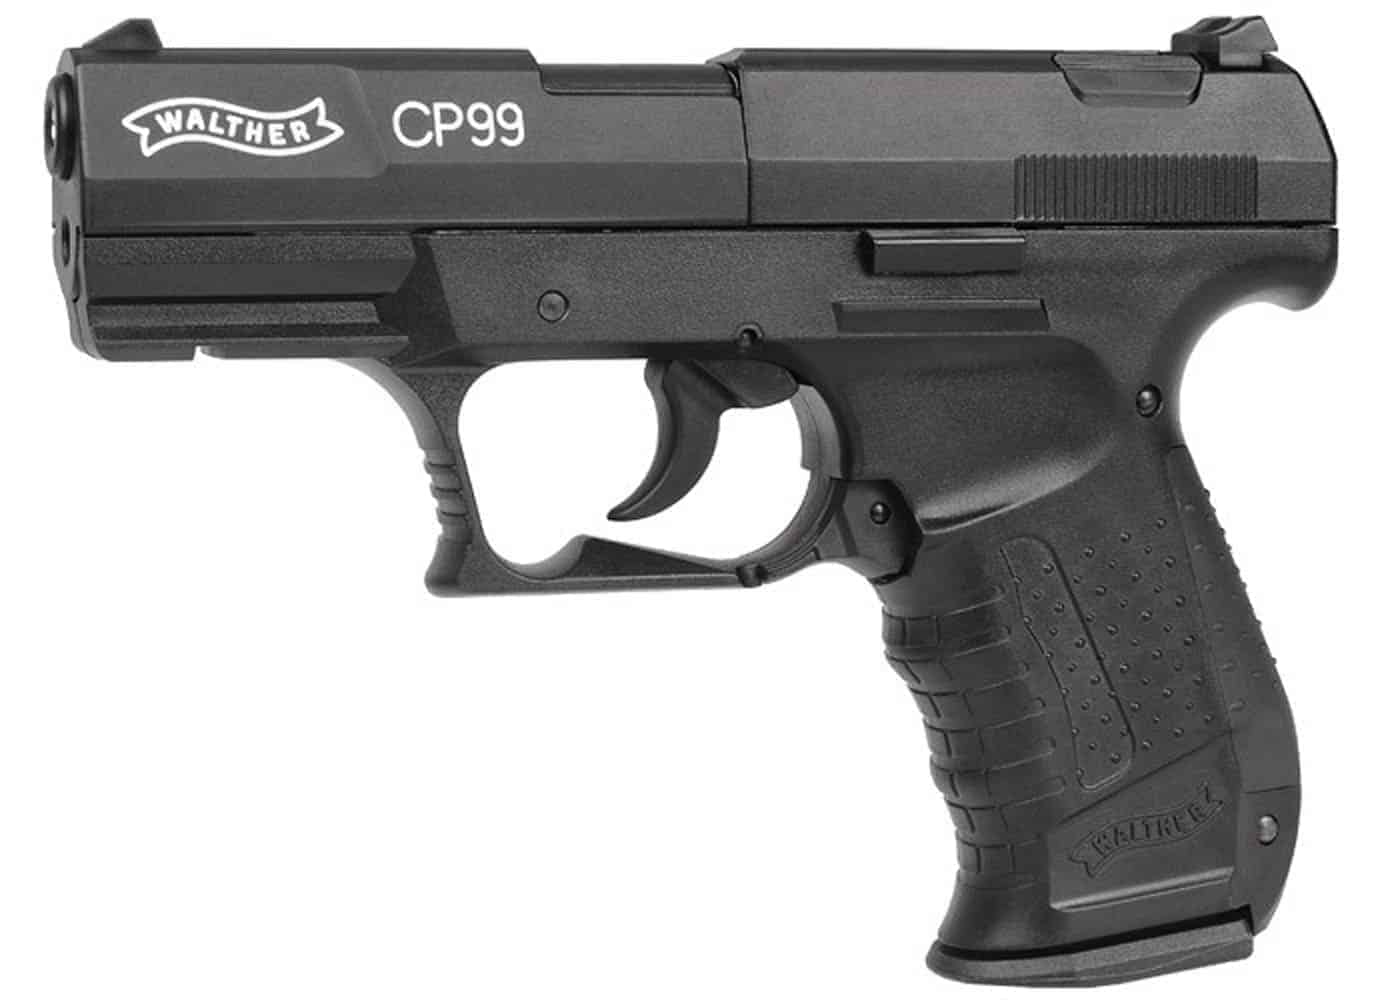 CP 99 spy pistol